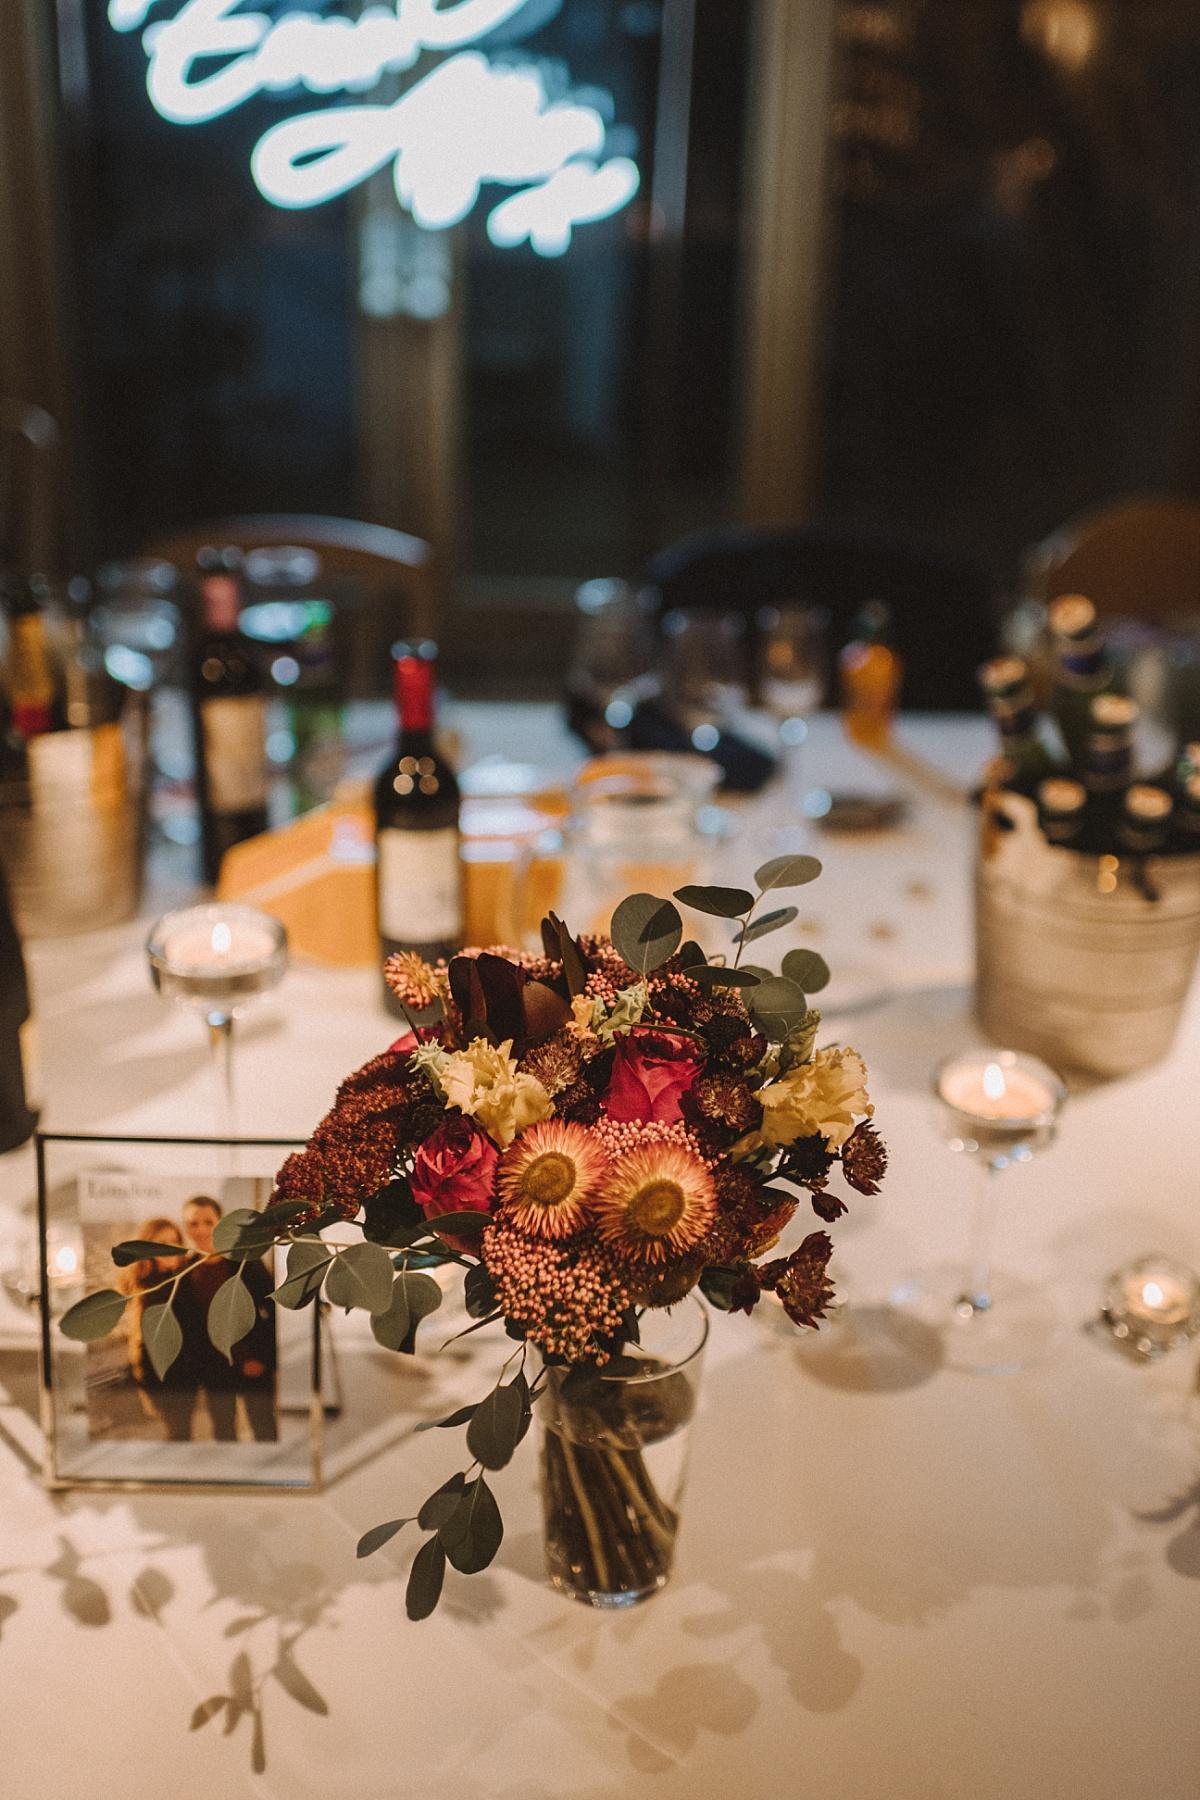 Wedding reception details at Bury Court Barn